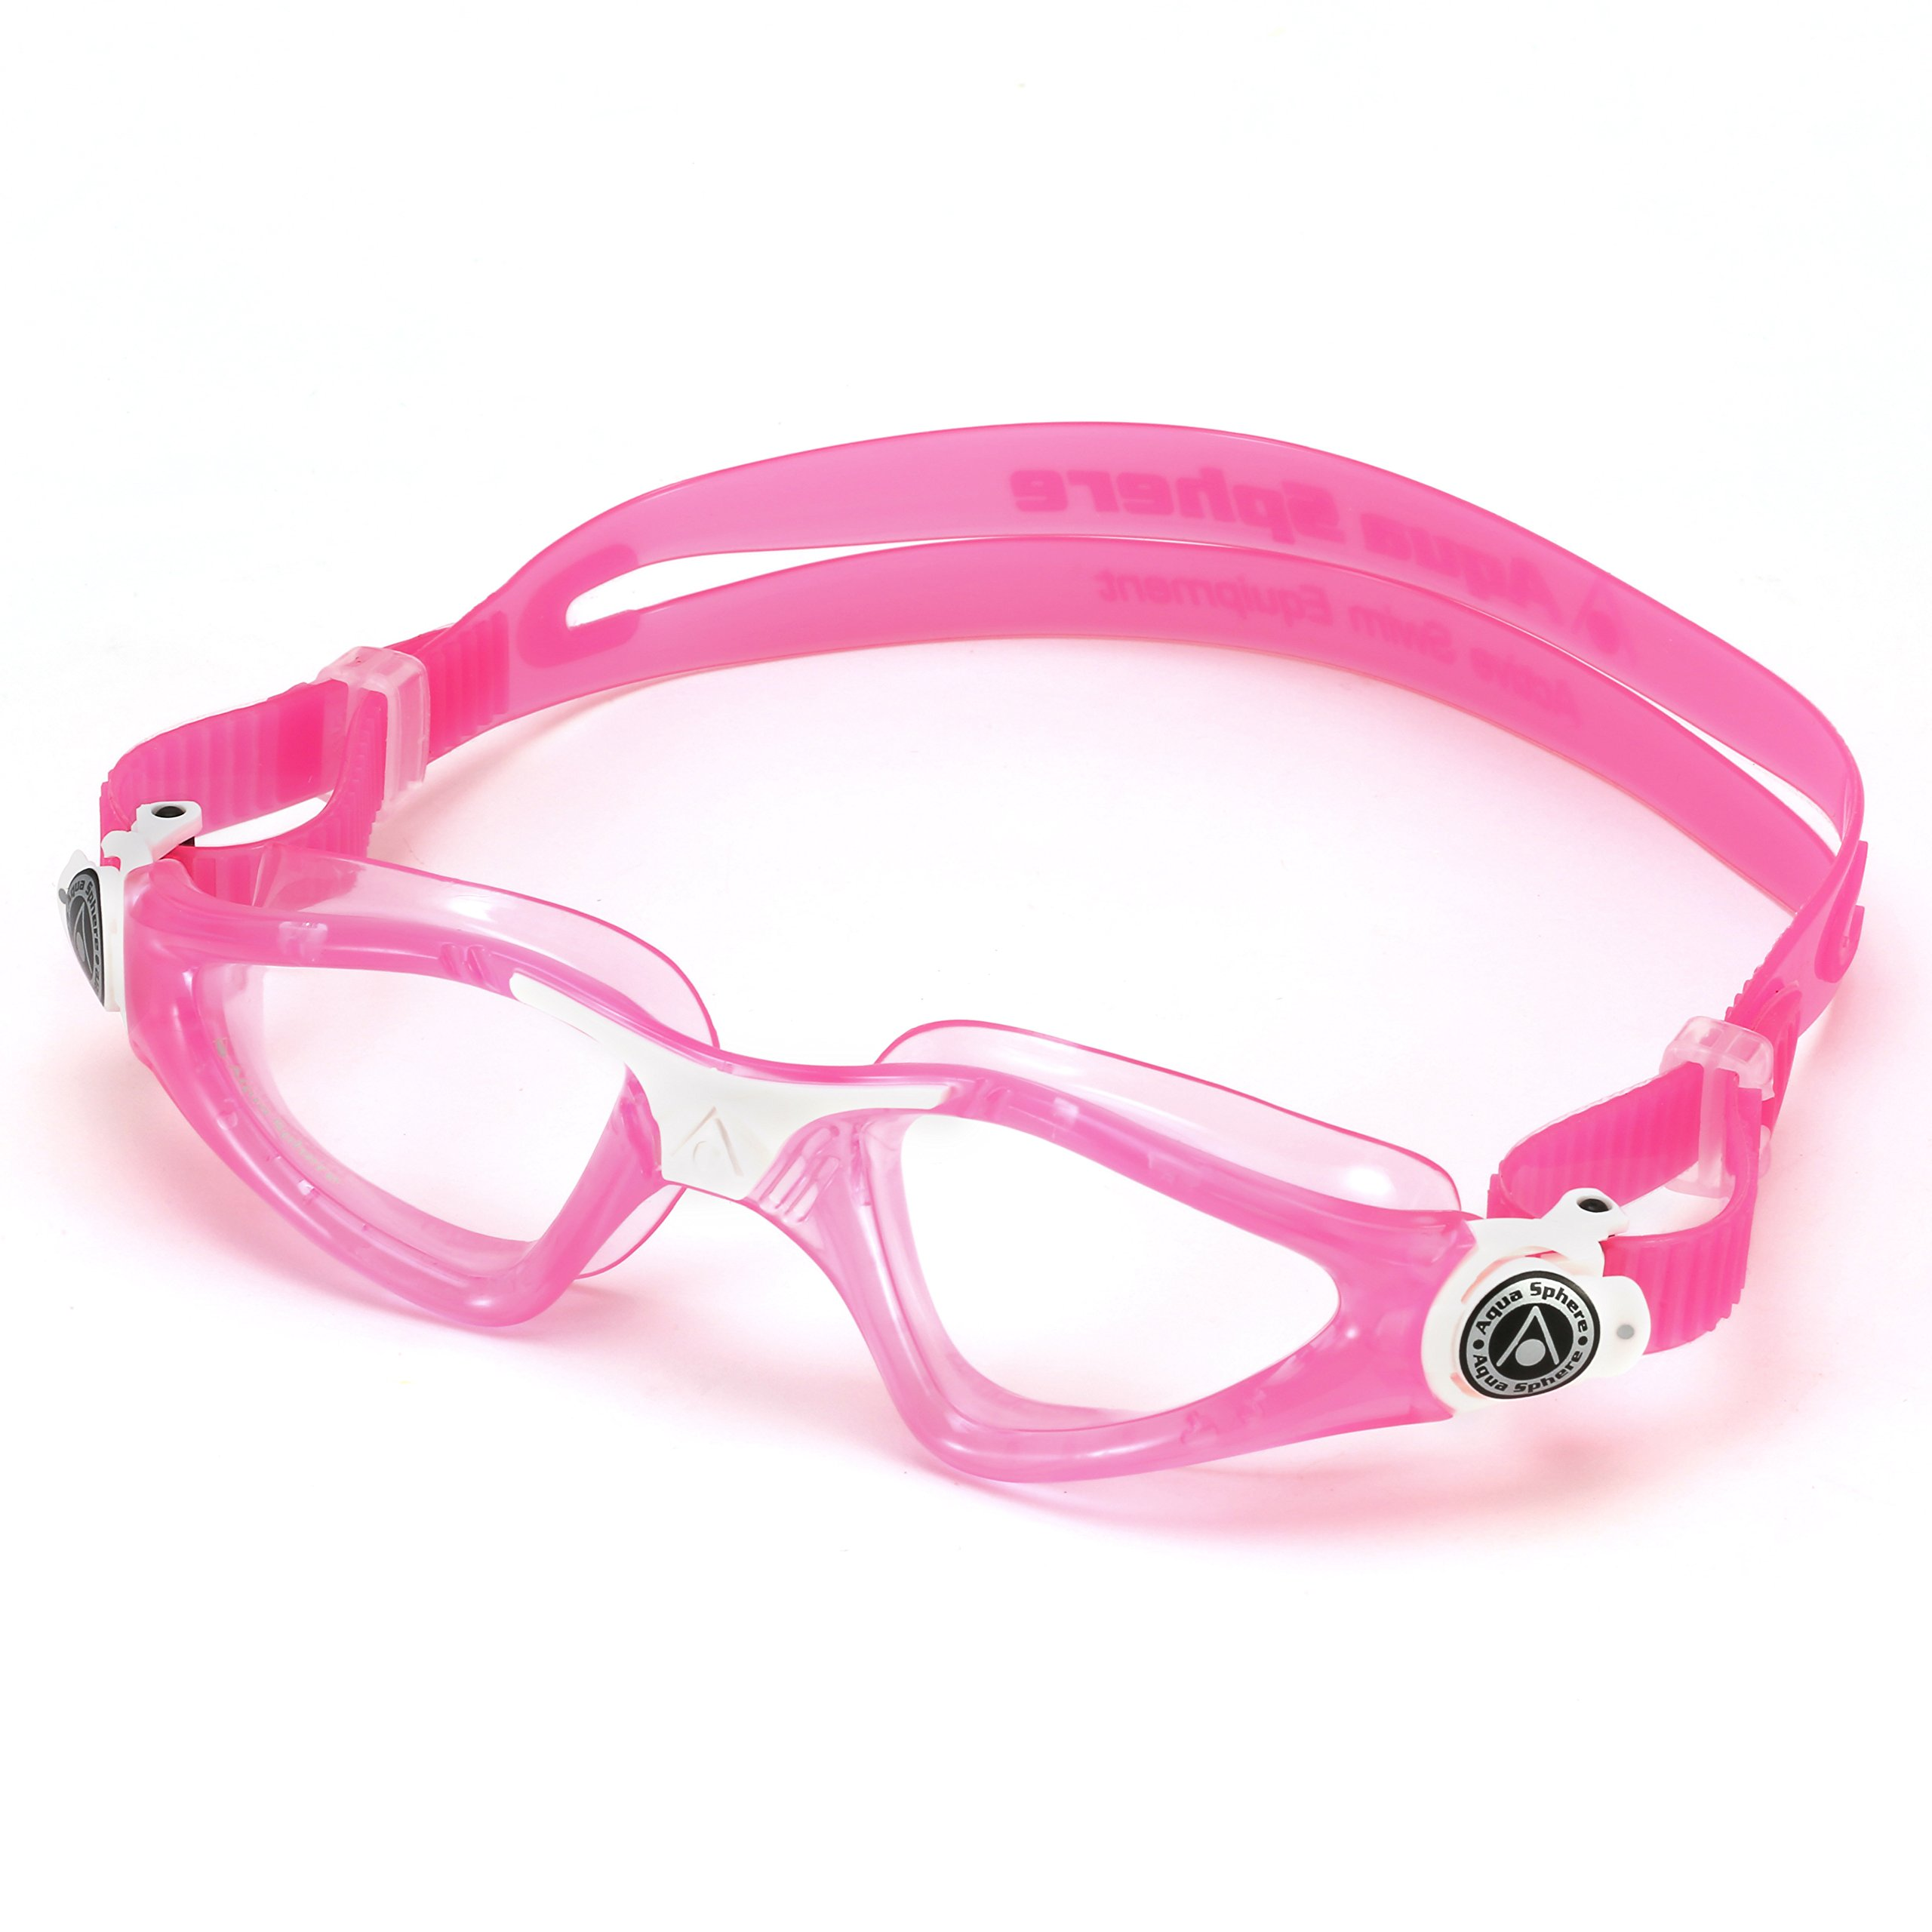 Aqua Sphere Kayenne Junior Swim Goggle Made In Italy